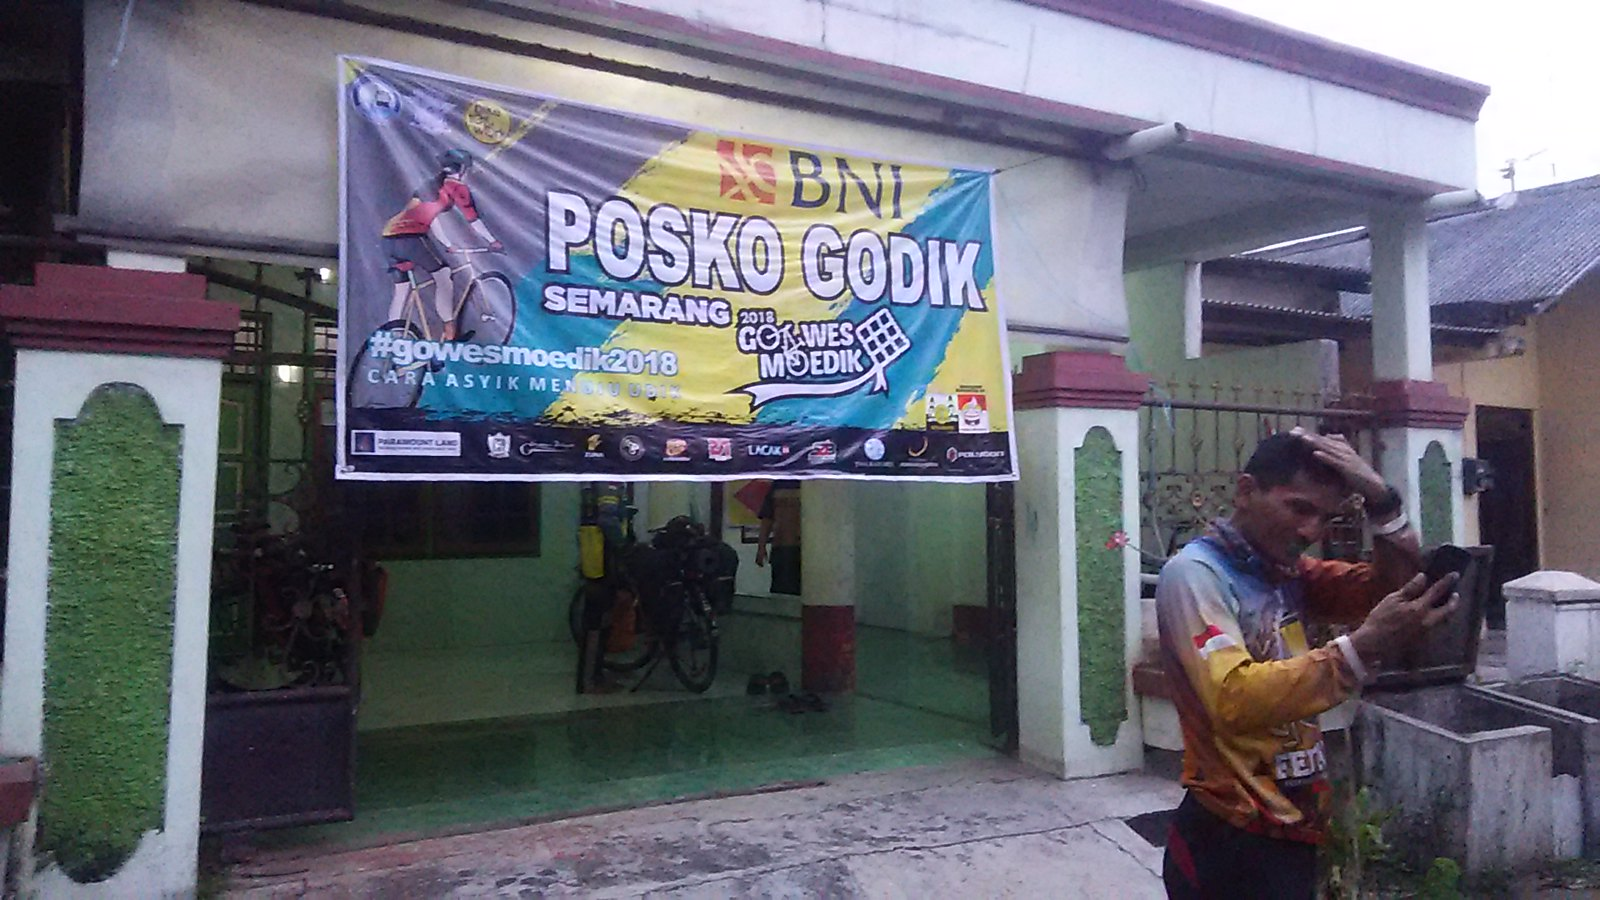 Posko Godik Semarang